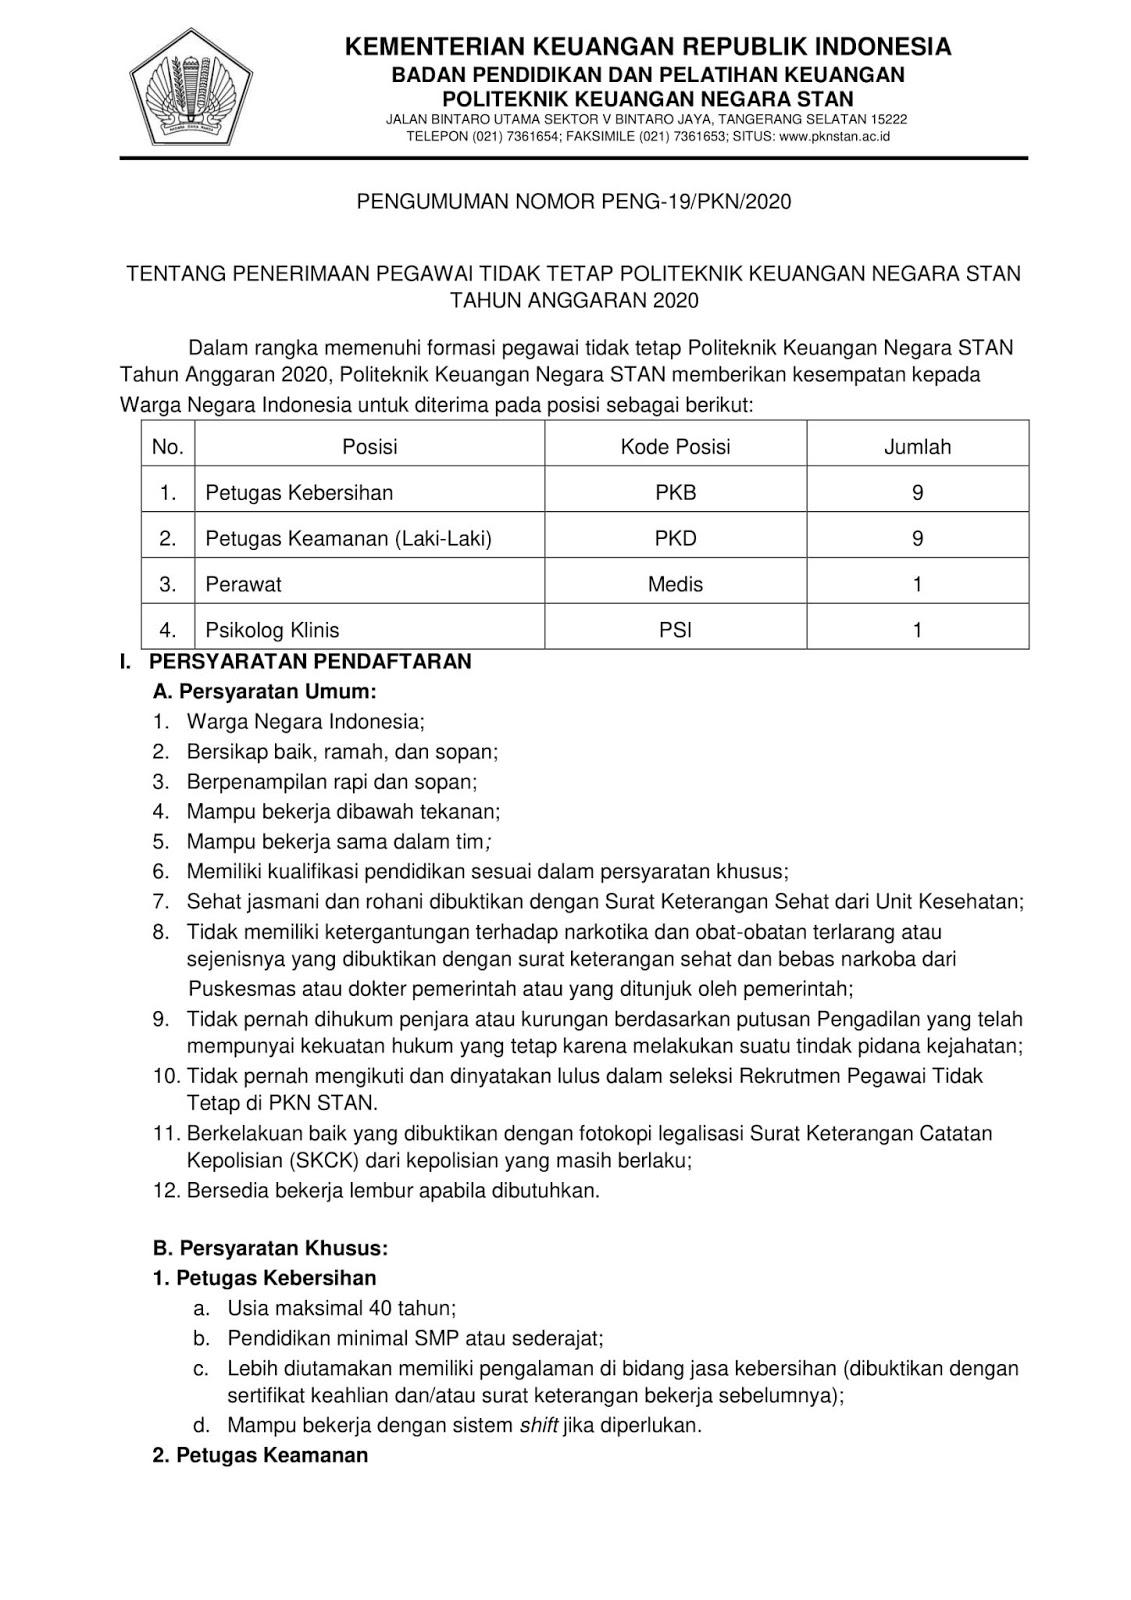 Rekrutmen Non PNS Pegawai PTT PKN STAN Kementerian Keuangan Bulan Maret 2020